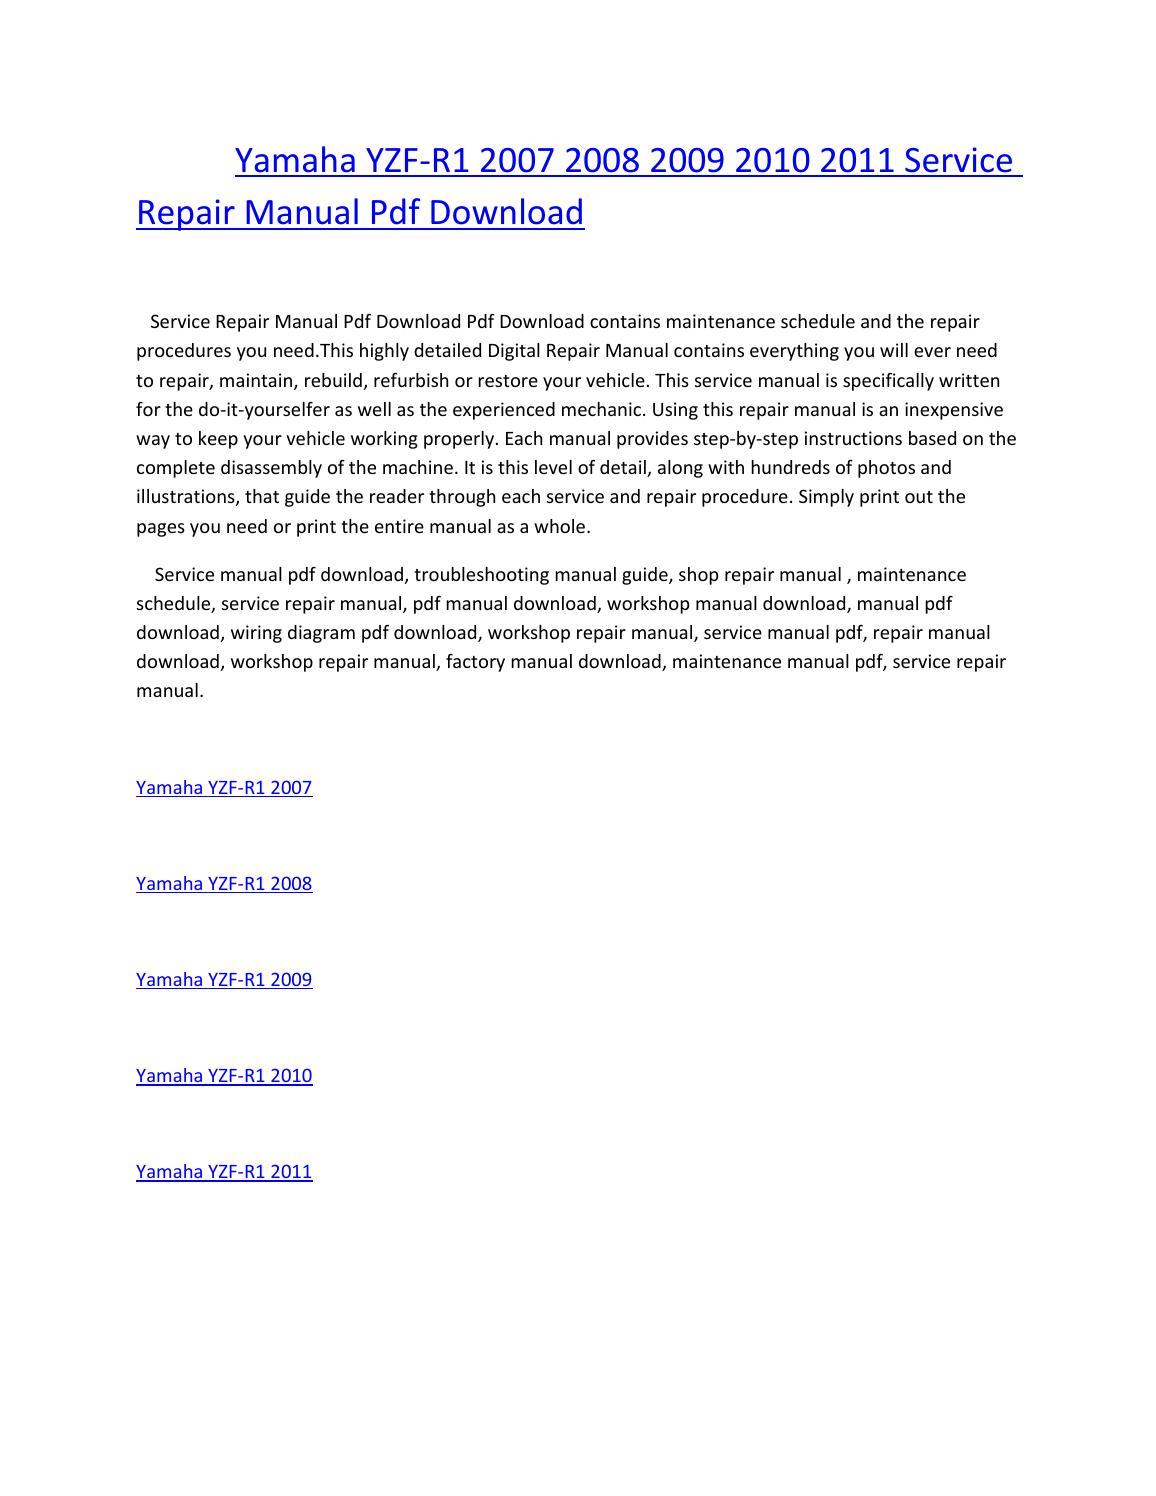 hight resolution of yamaha yzf r1 2007 2008 2009 2010 2011 service repair manual pdf download